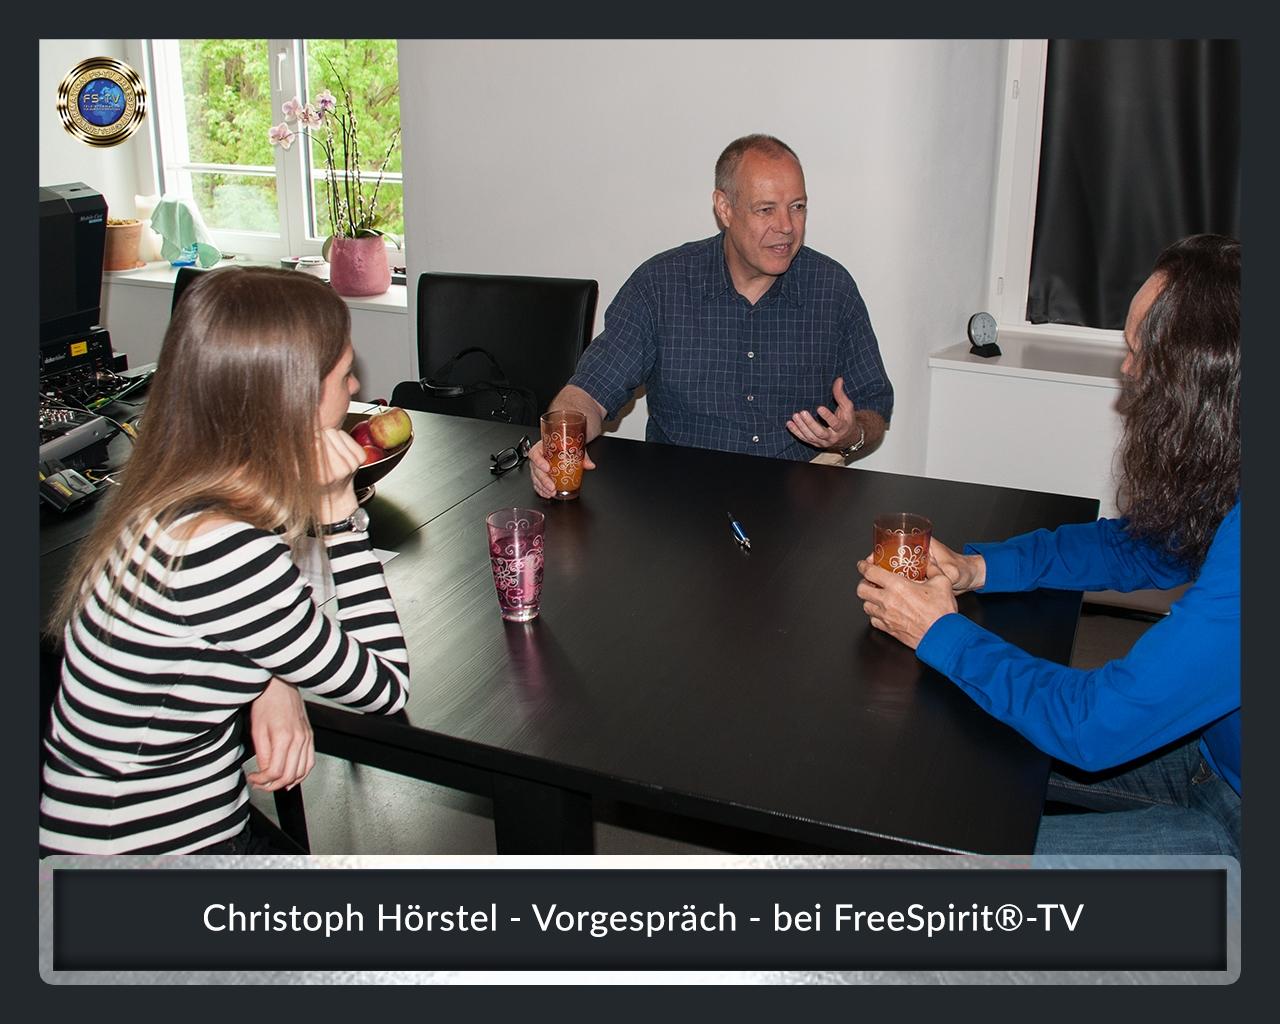 FS-TV-Bildergallerie-Hörstel 1